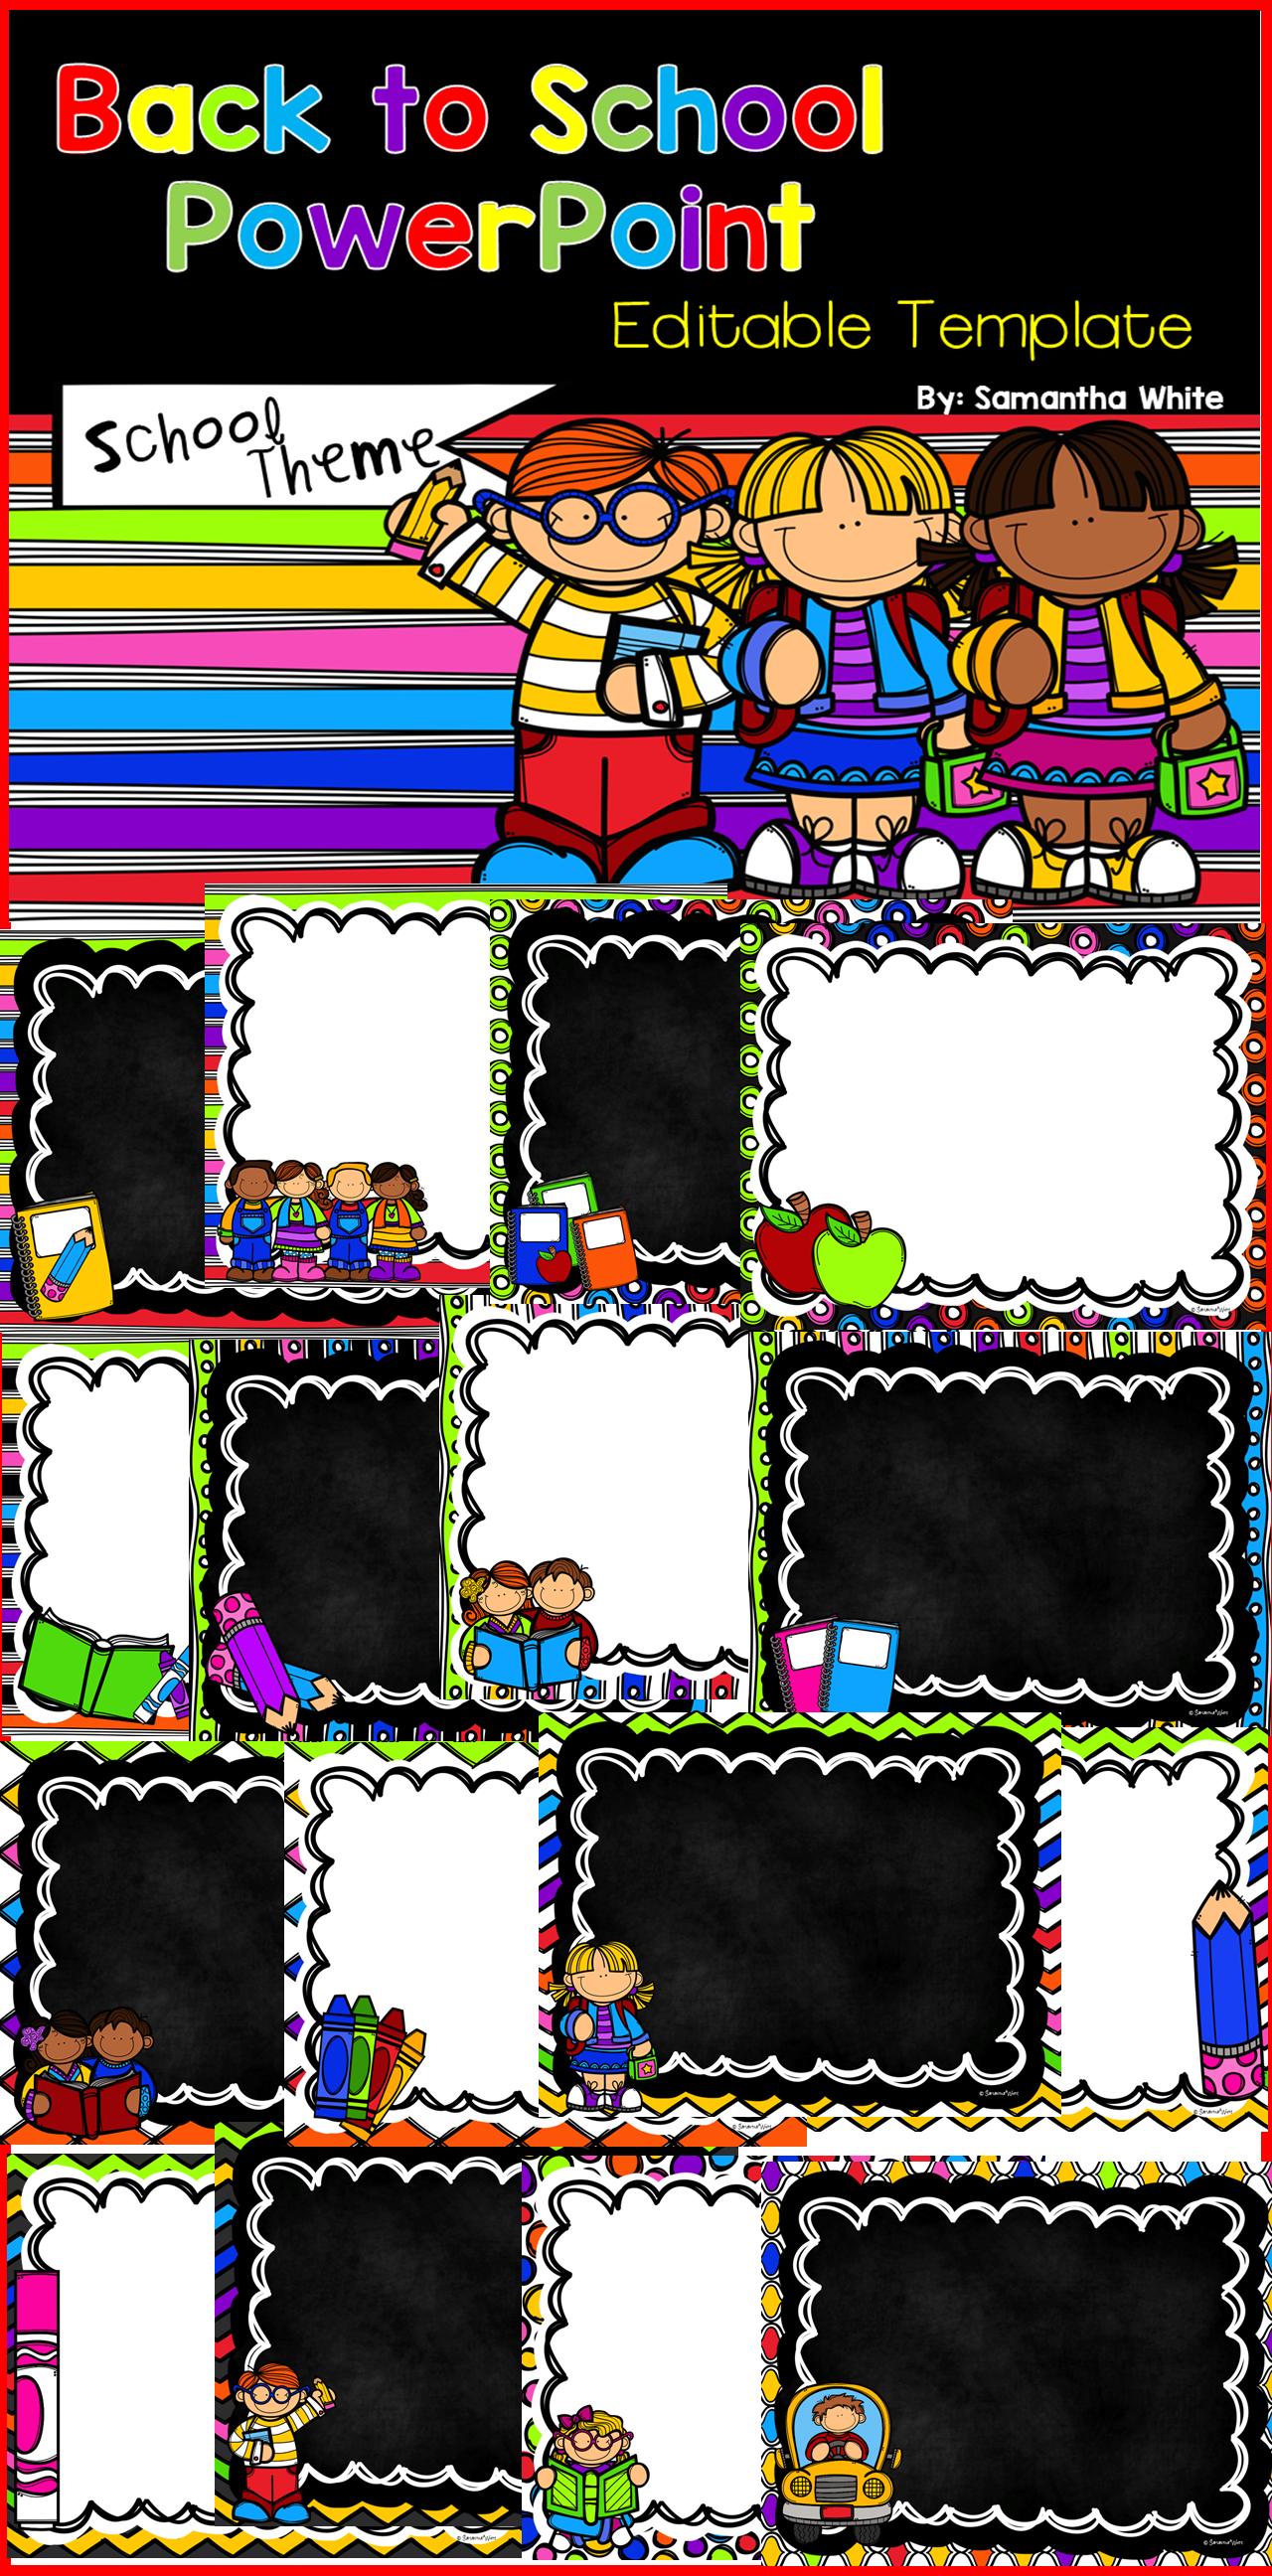 Back to school editable powerpoint school theme school themes back to school editable powerpoint school theme alramifo Image collections